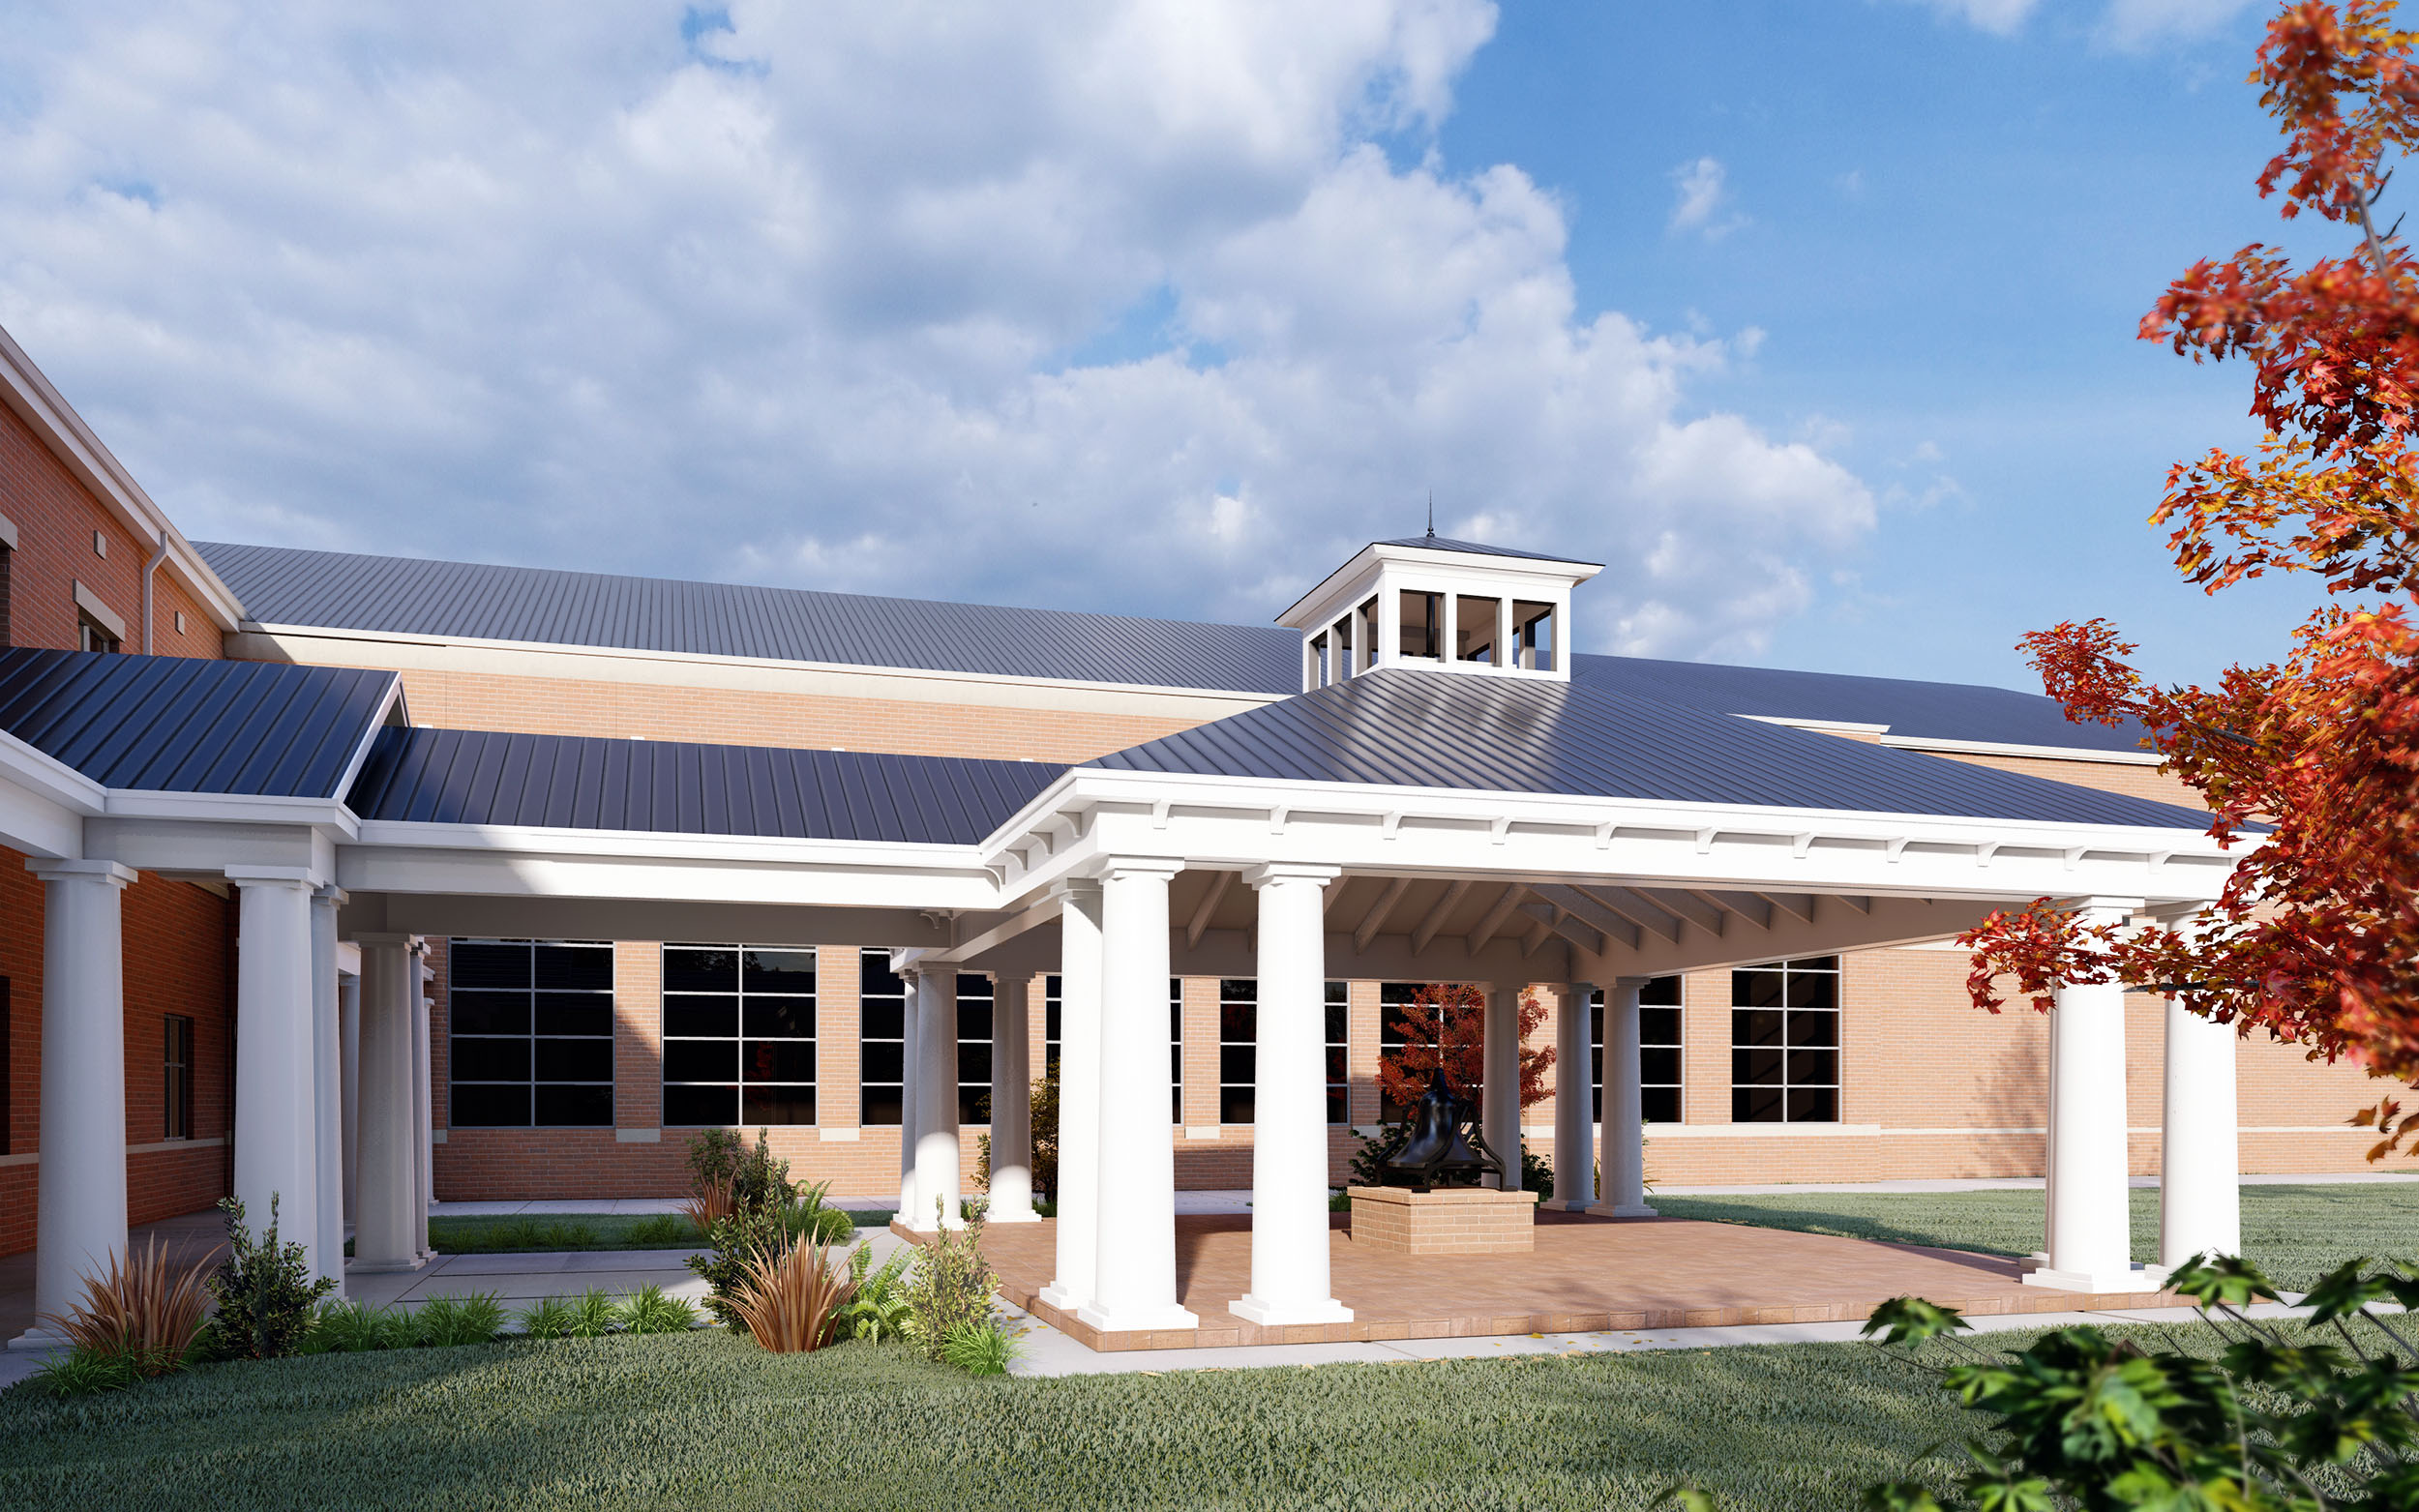 Cape Fear Academy Bell Pavilion